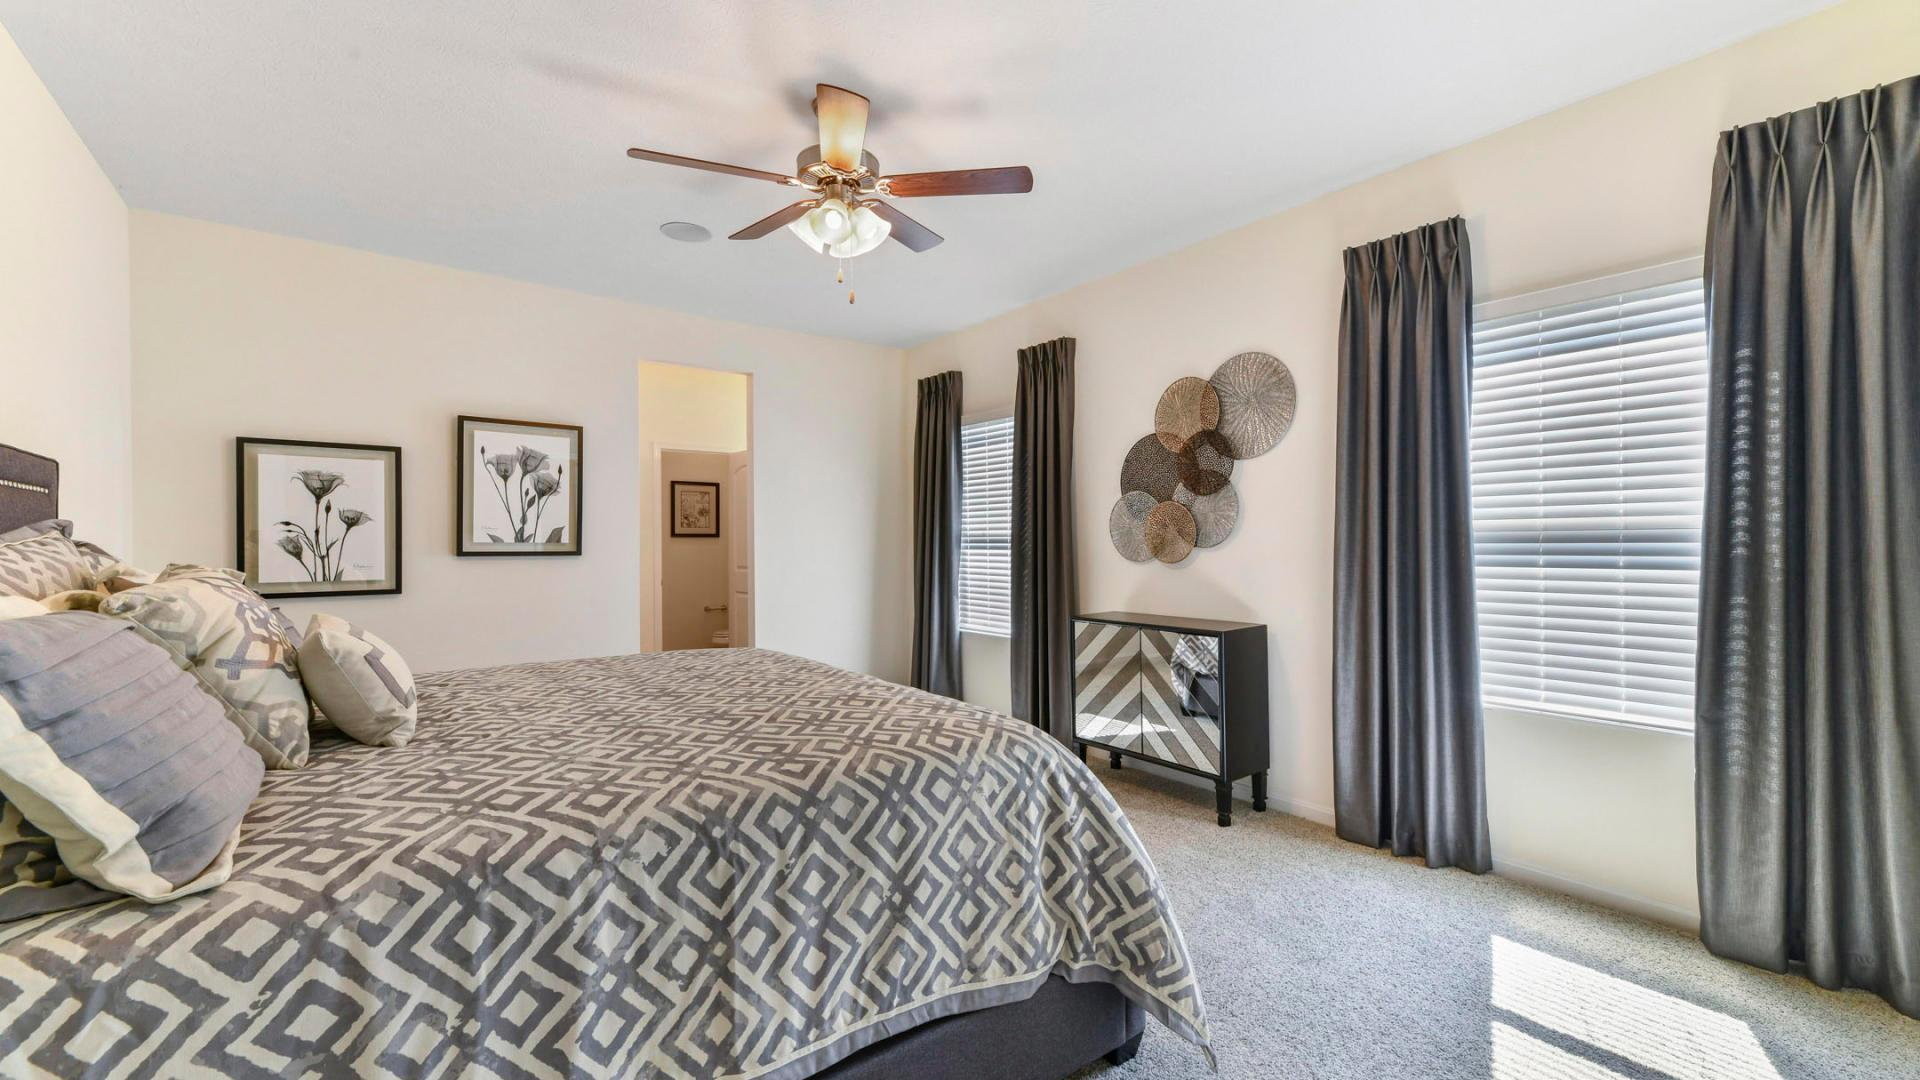 Bedroom featured in the Wilmington By Maronda Homes in Cincinnati, OH